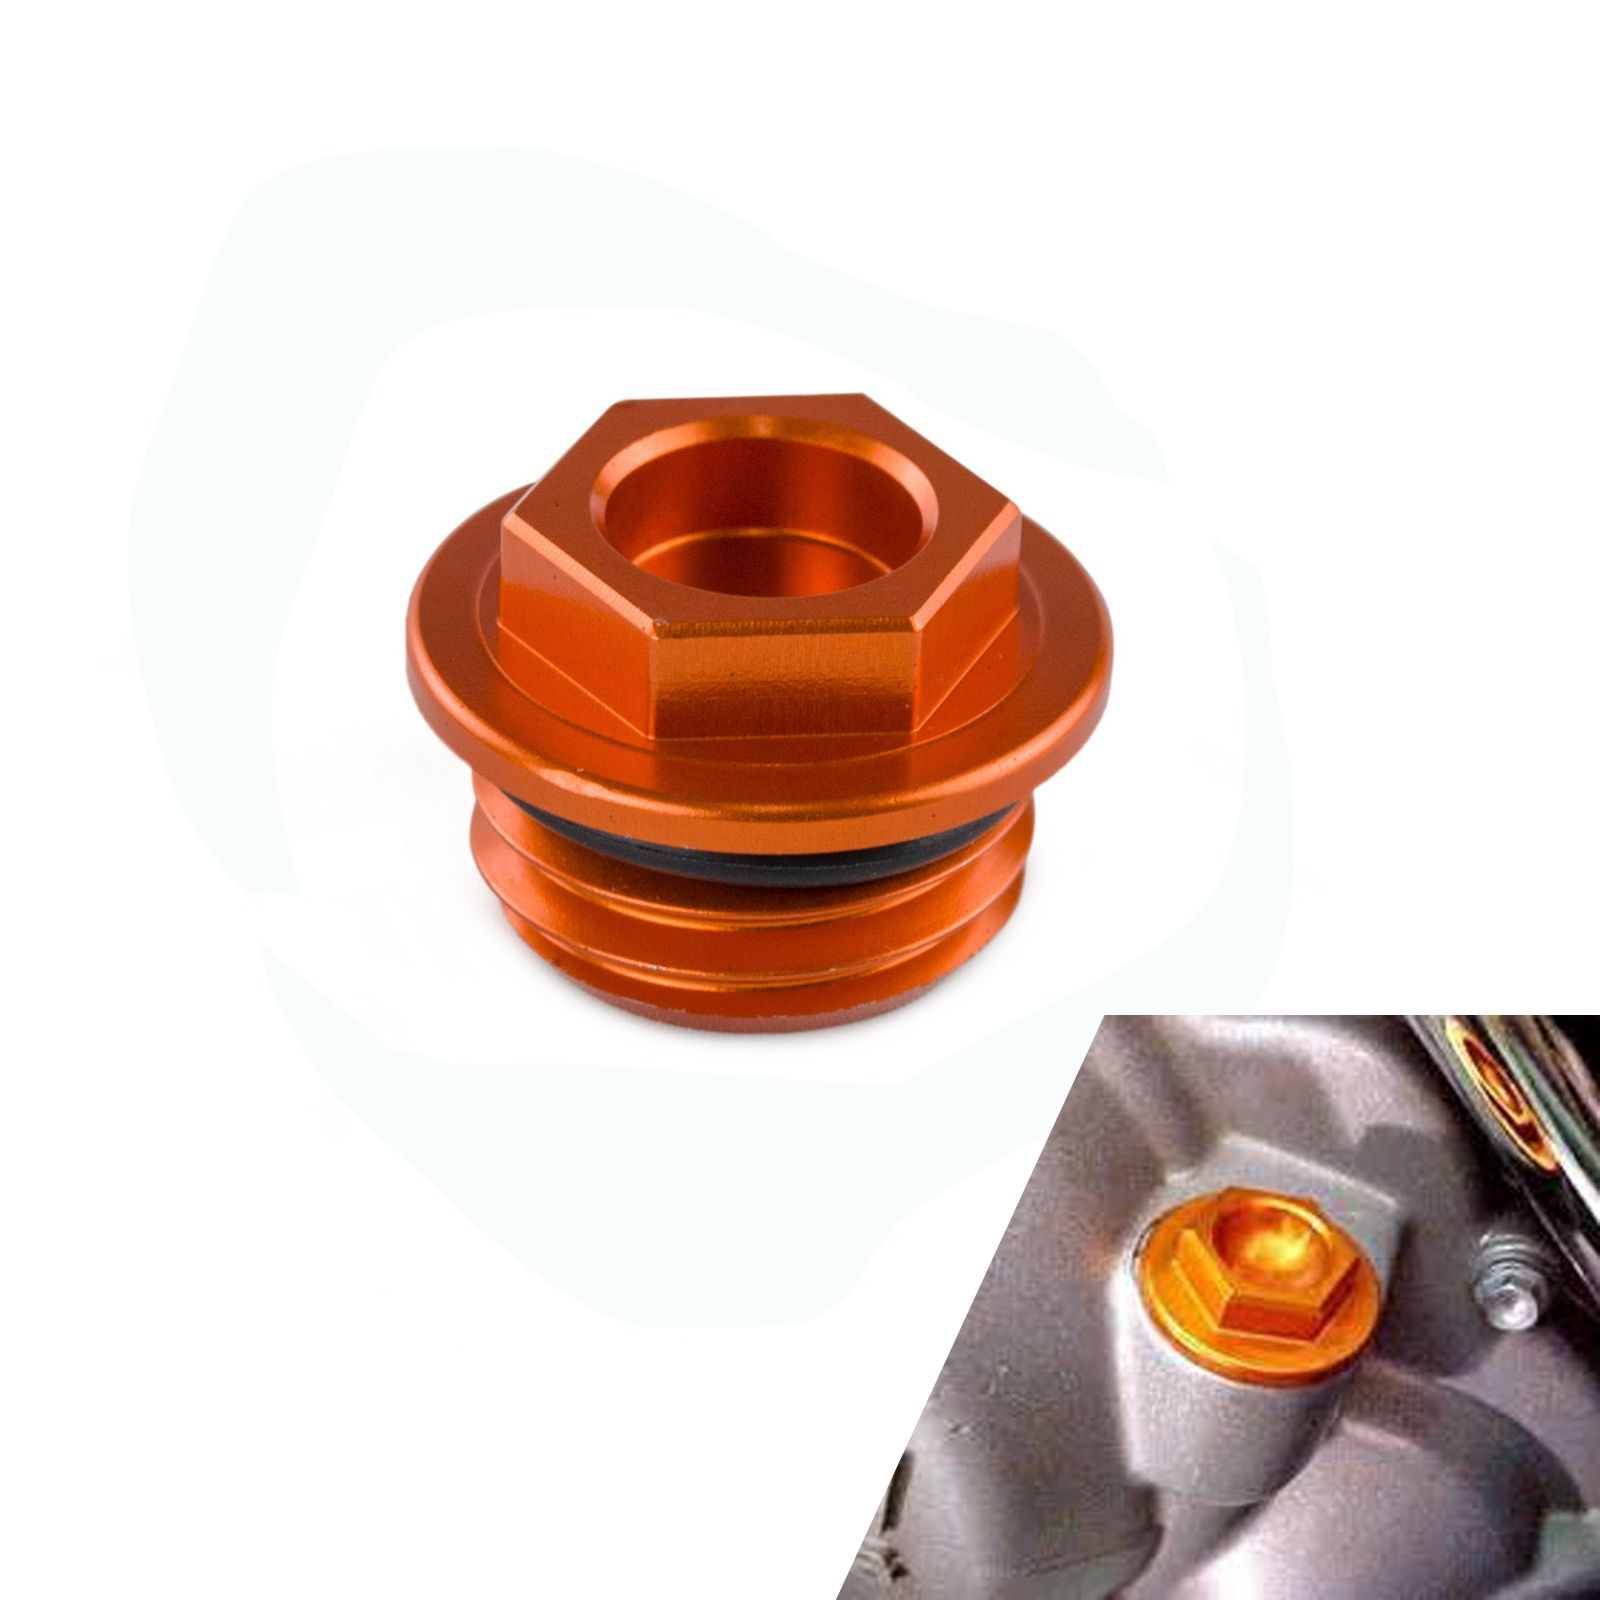 CNC Billet Oil Filler Cap Oil Plug For KTM SX XC EXC SMR EXC SX-F EXC-F XC XC-F XC-W 85 125 200 250 300 350 400 450 500 525 530